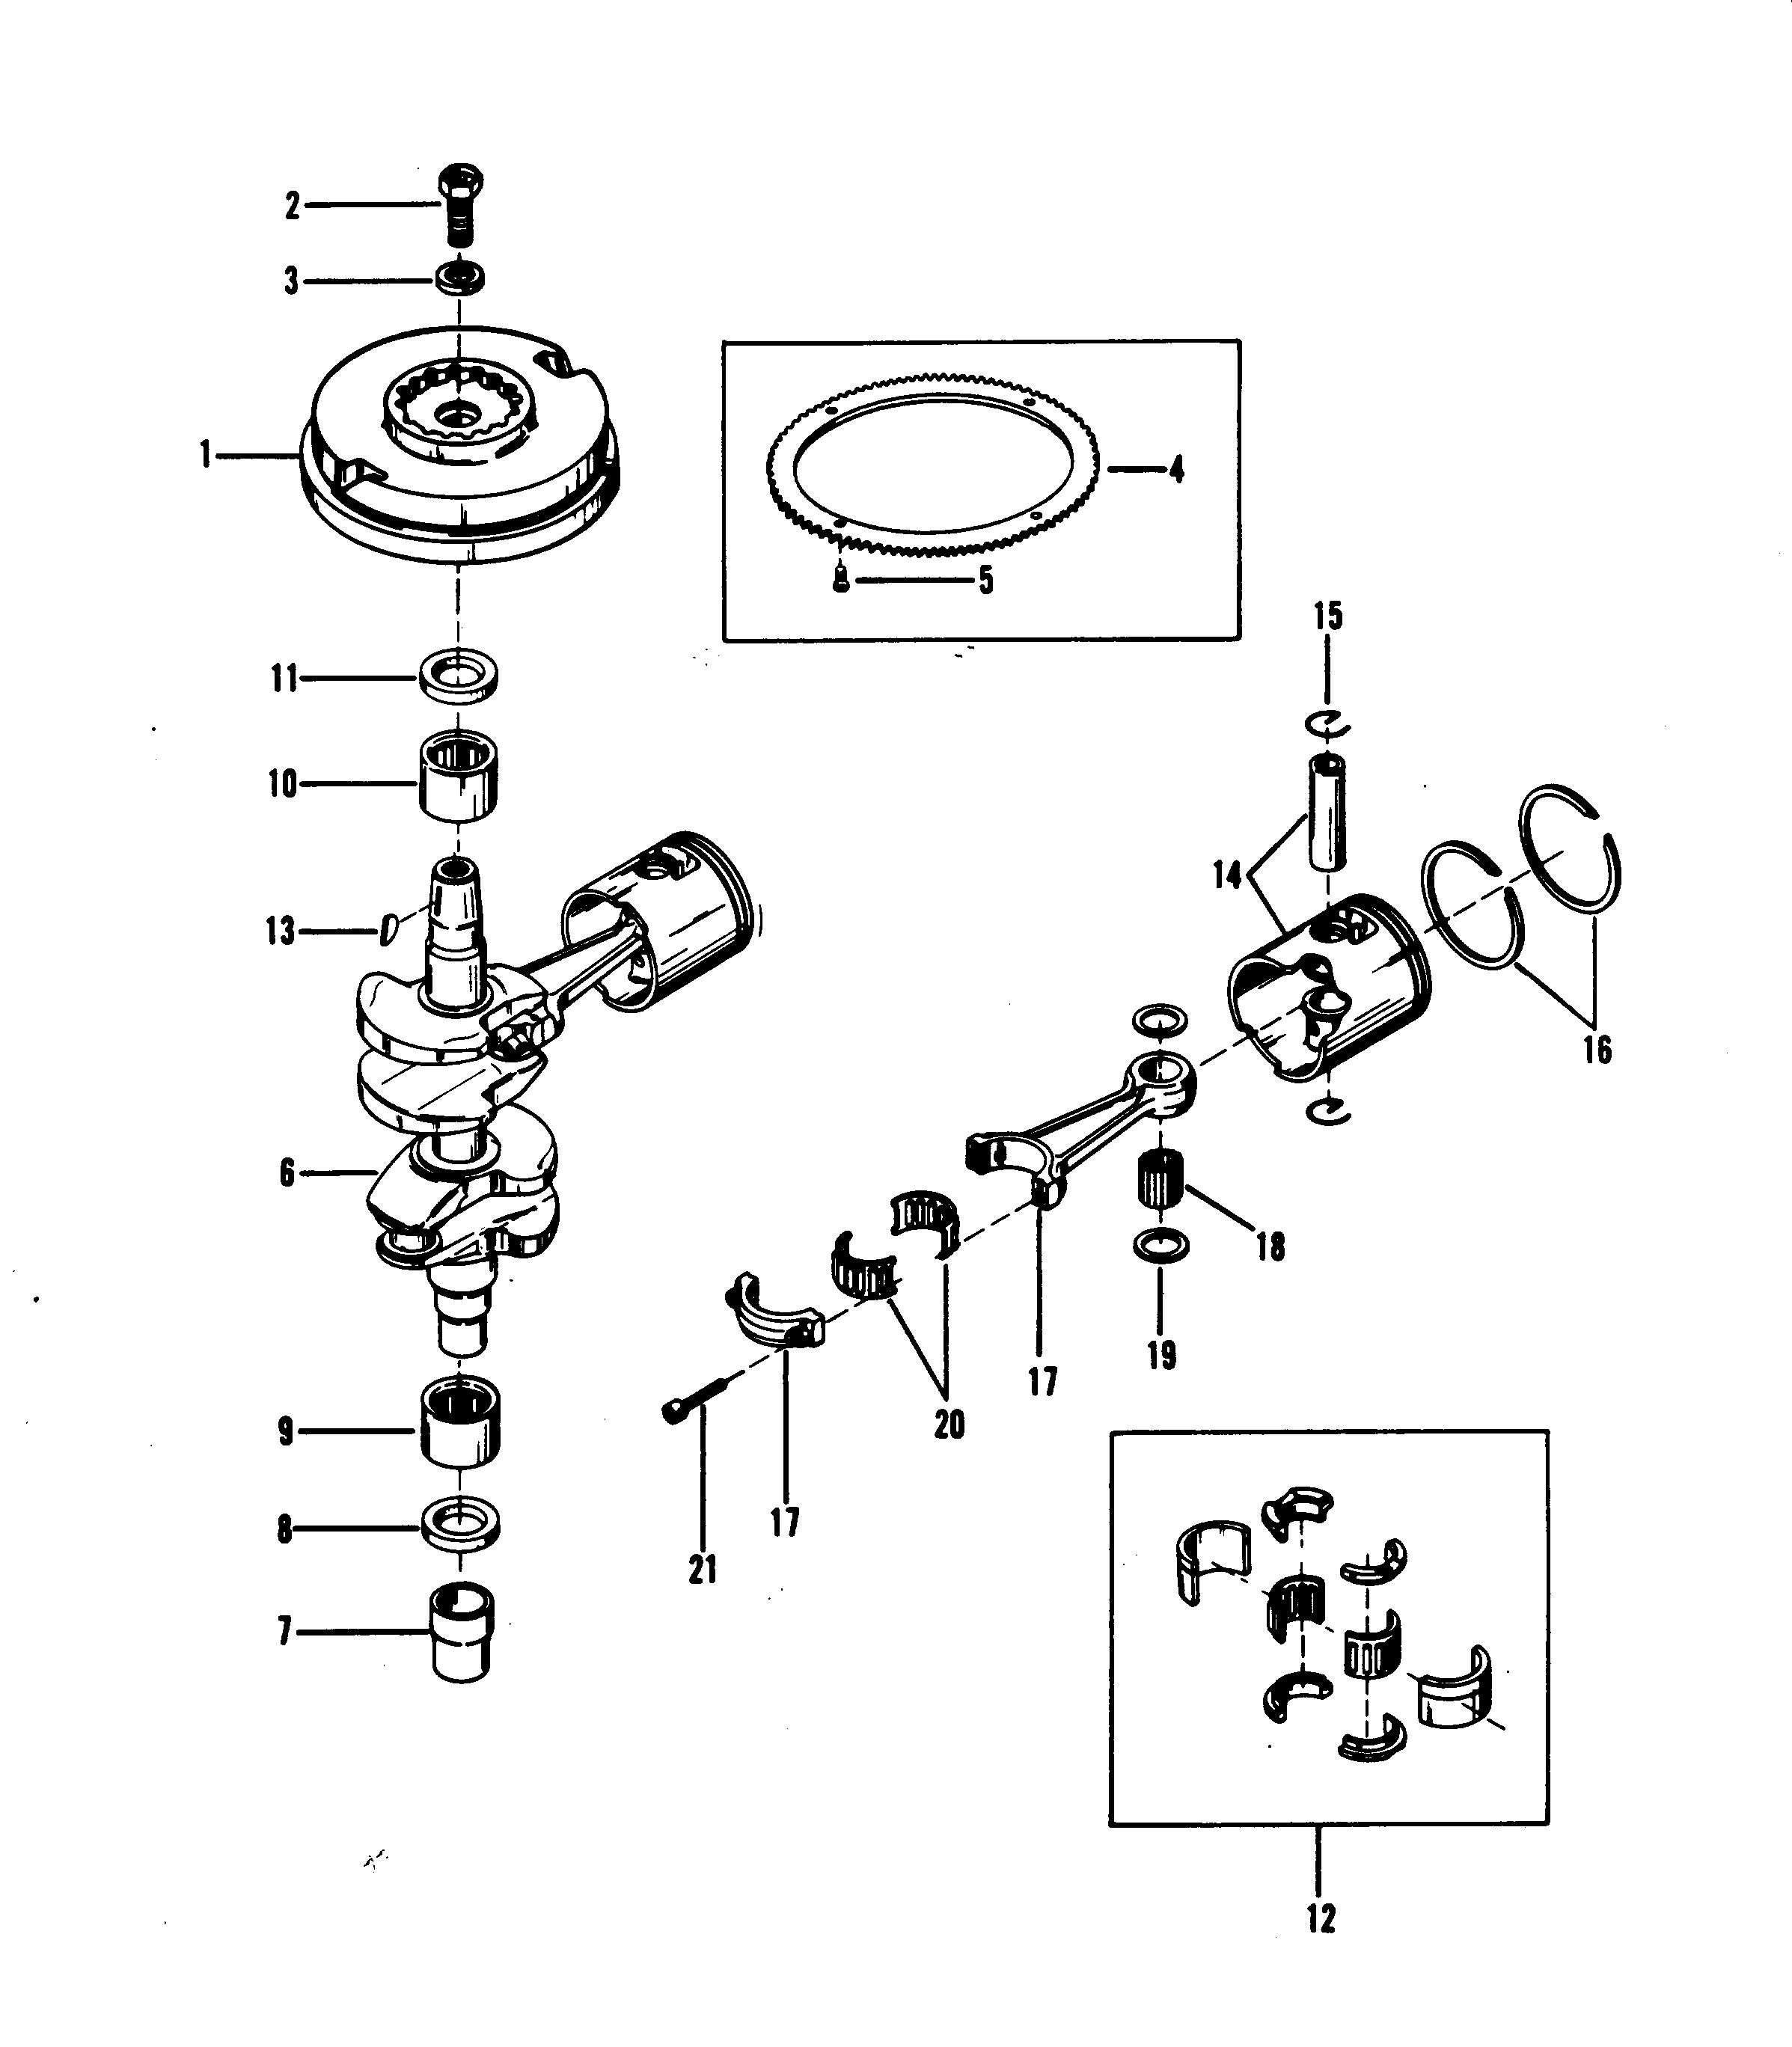 CRANKSHAFT, PISTONS AND FLYWHEEL FOR MARINER / MERCURY 18